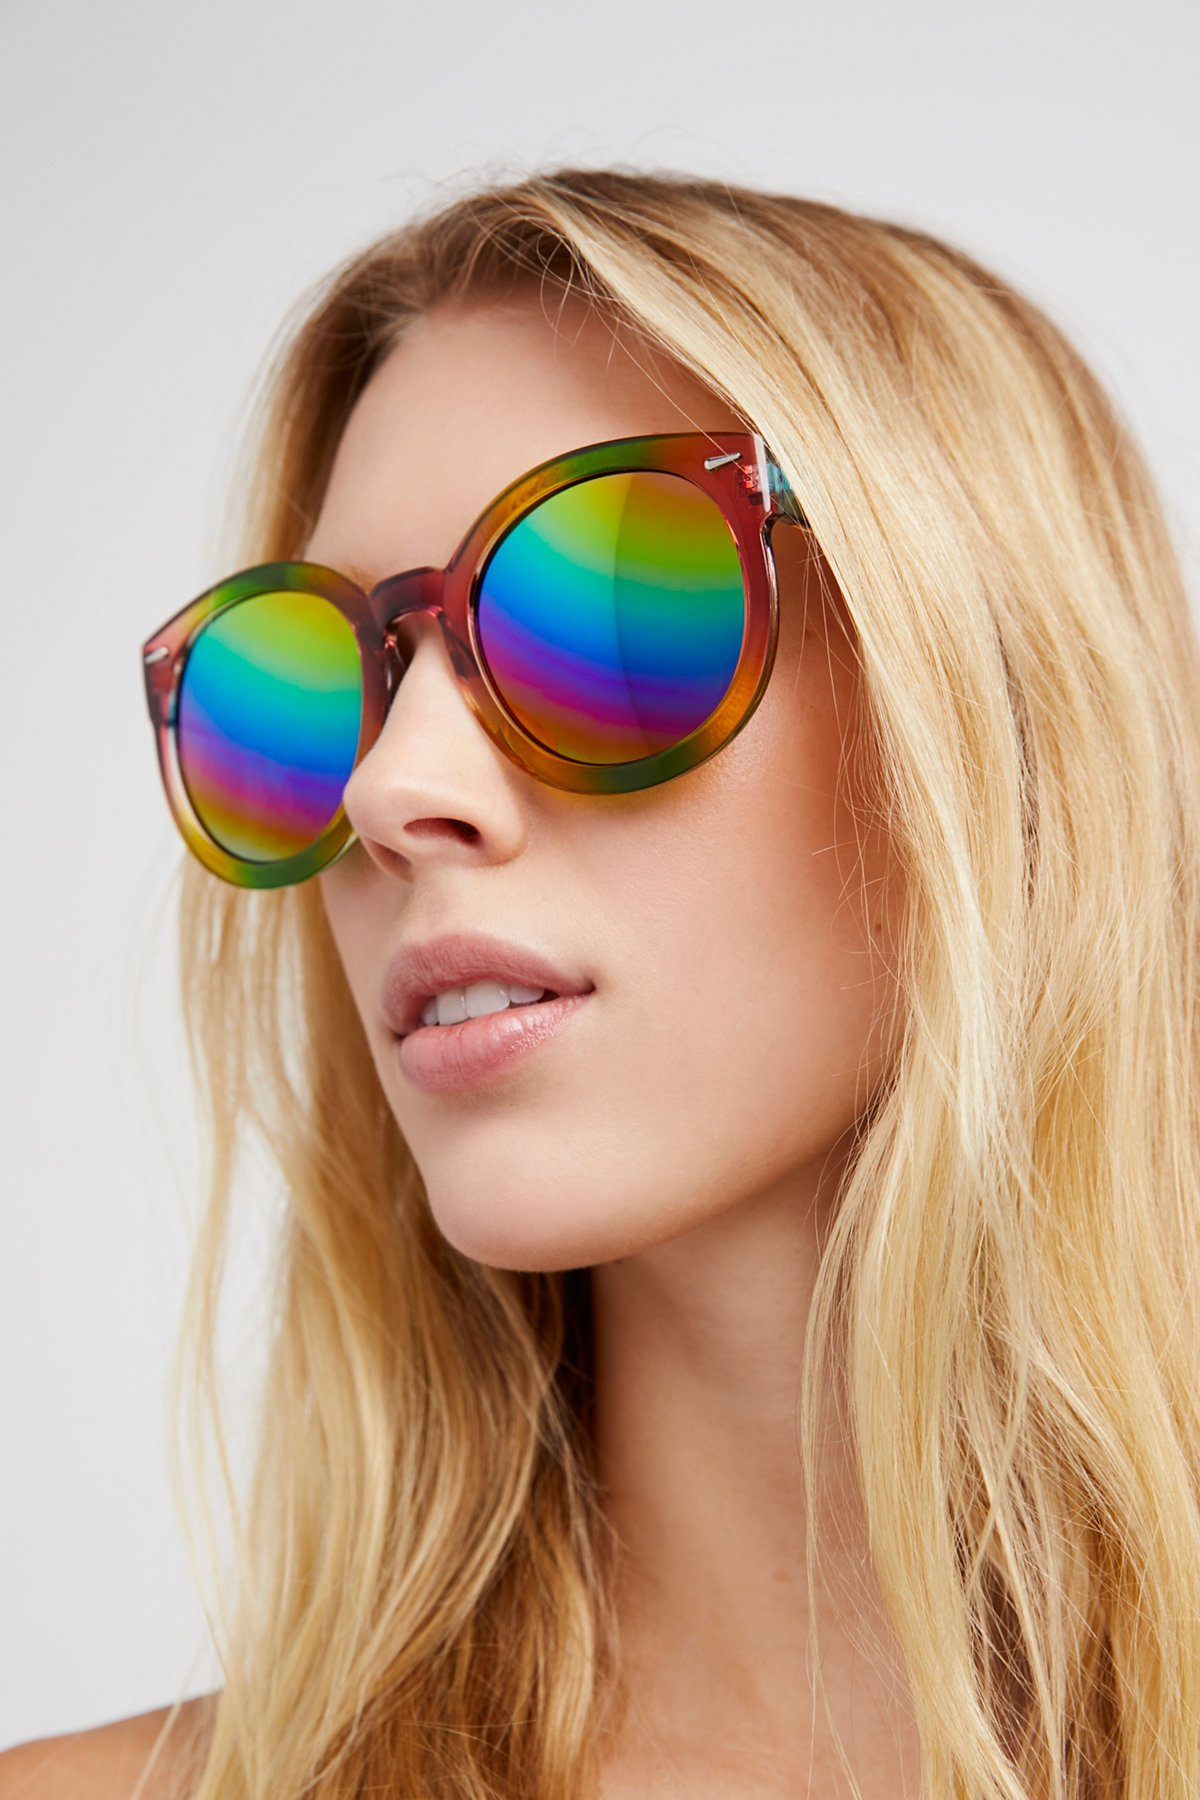 Double Rainbow Sunglasses